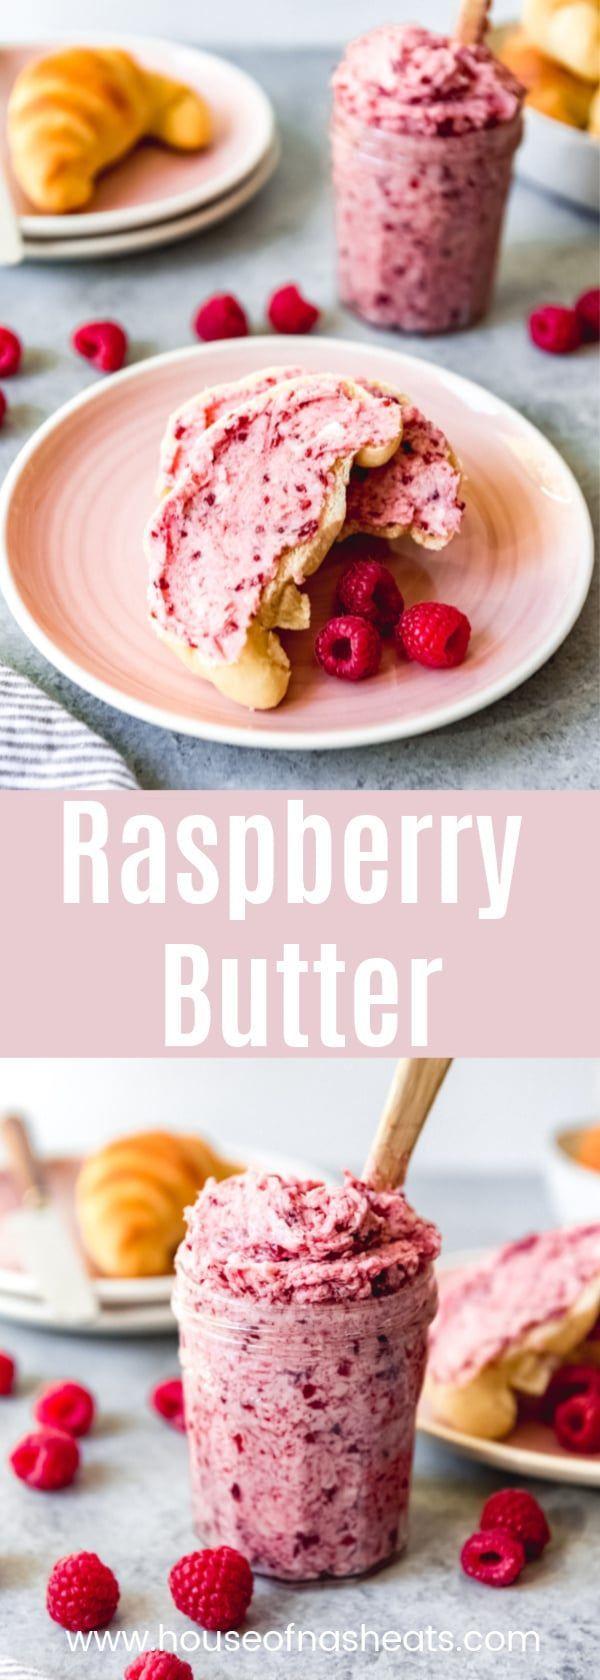 Raspberry Butter #homemadesweets